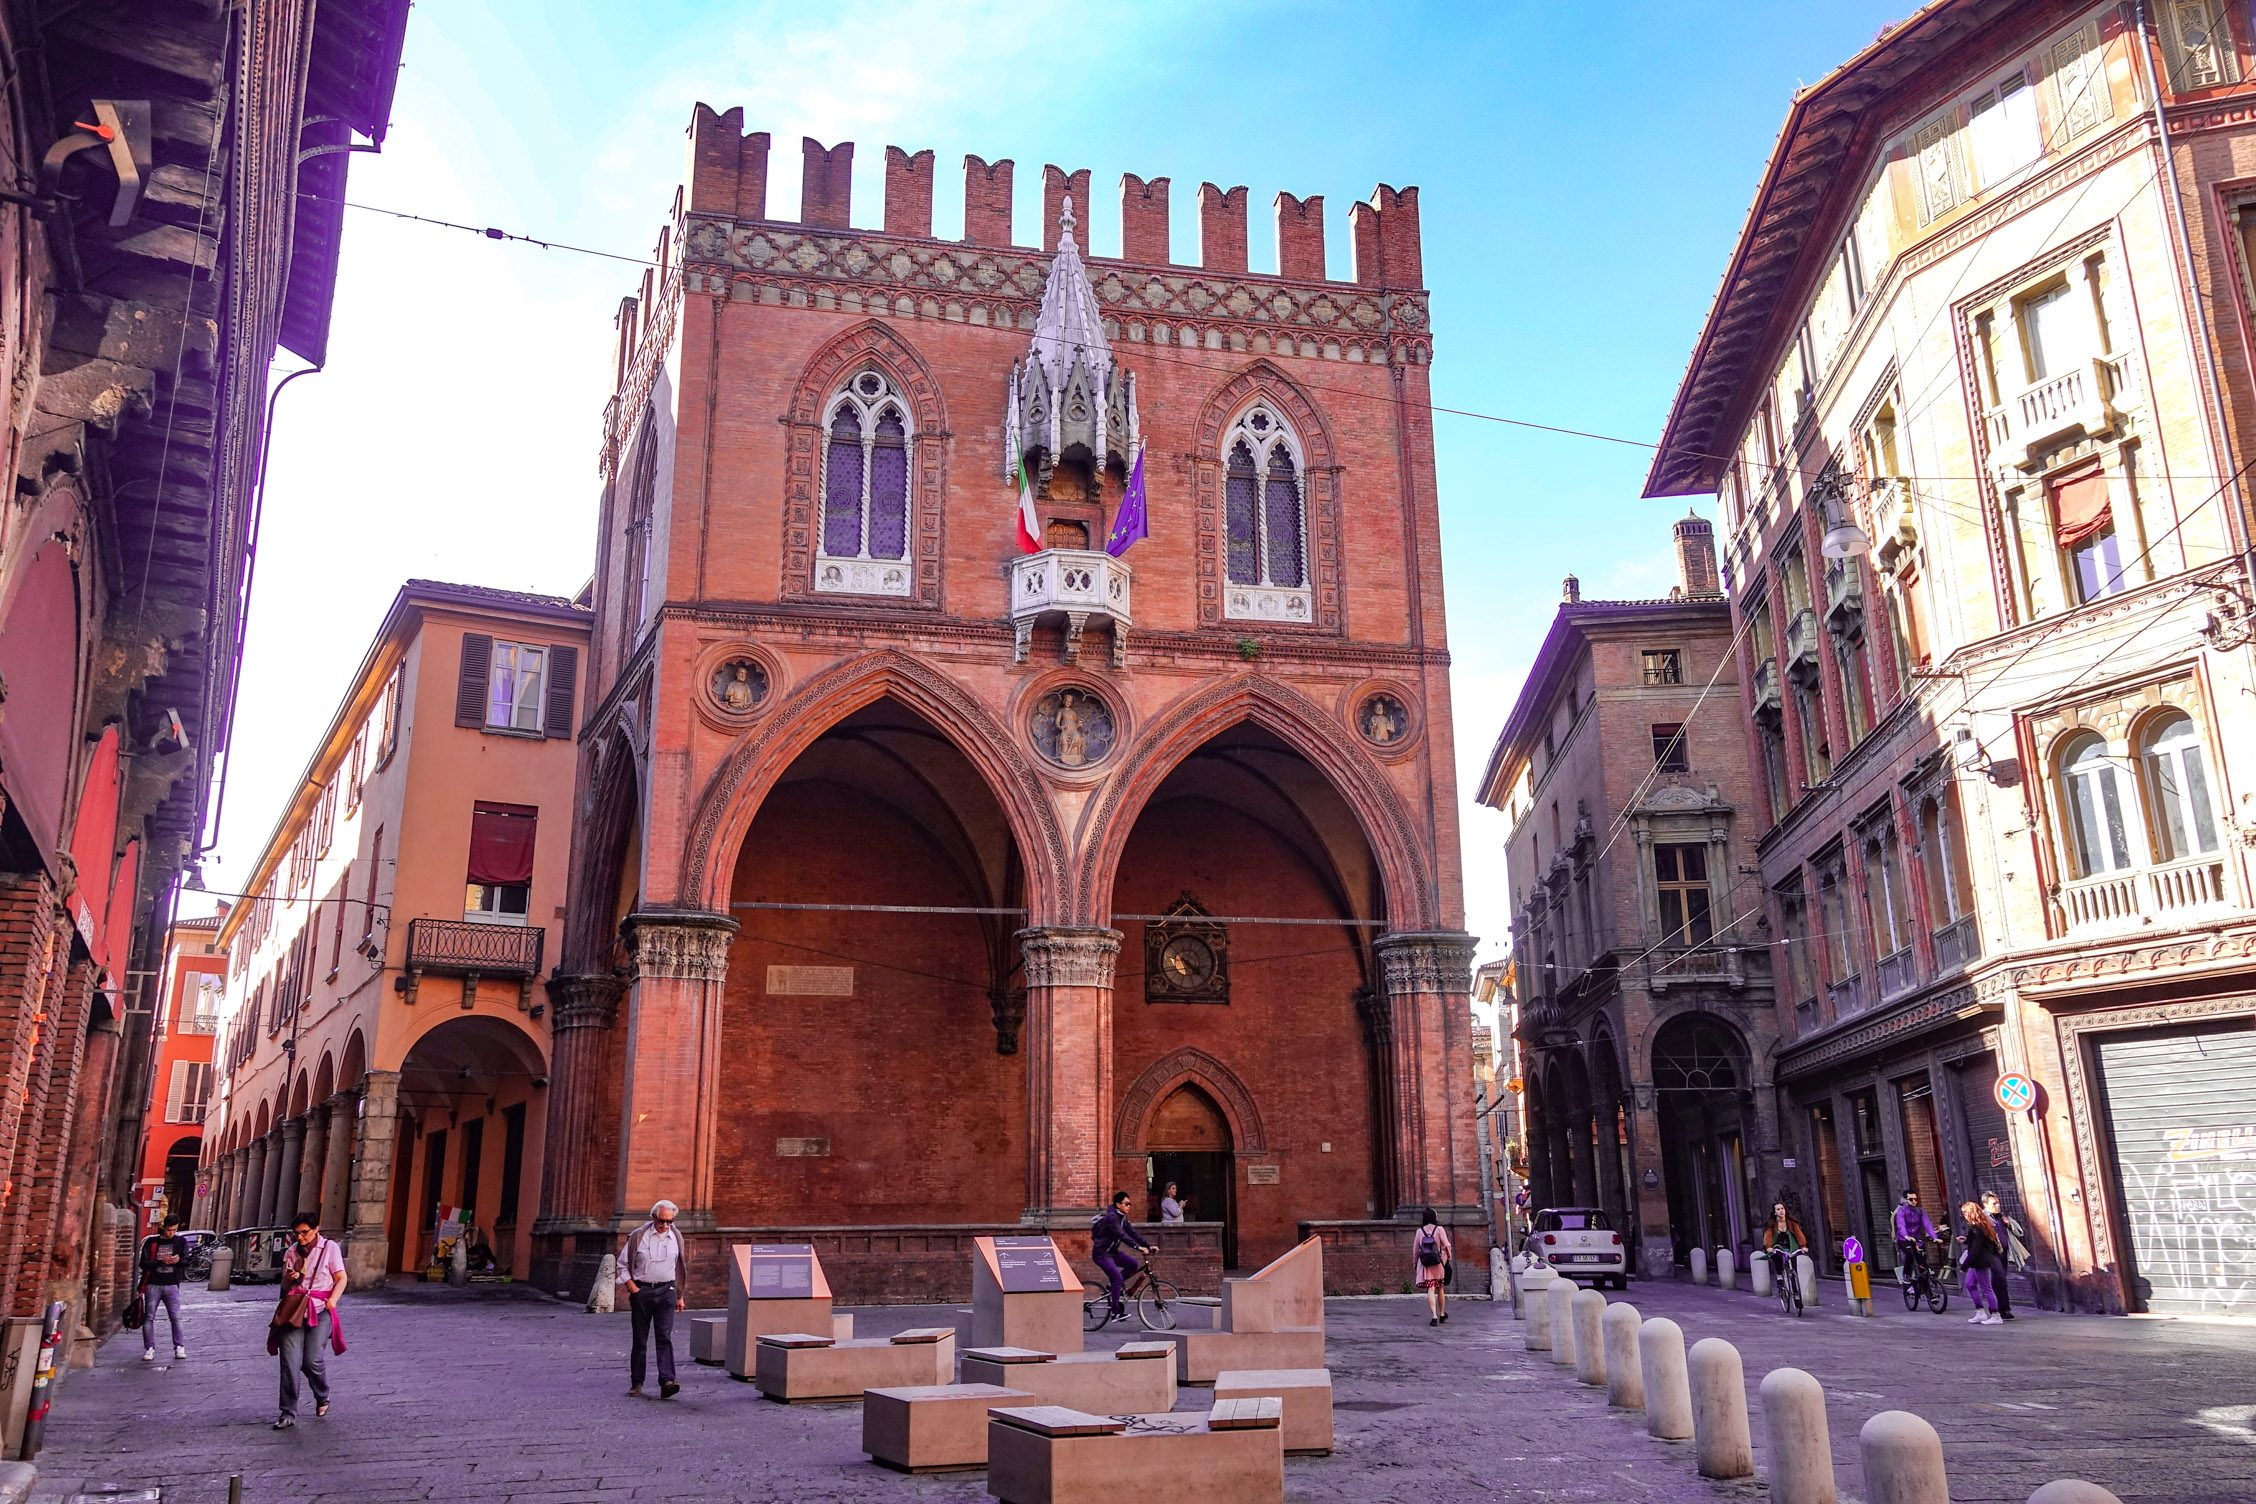 de Piazza della Mercanzia